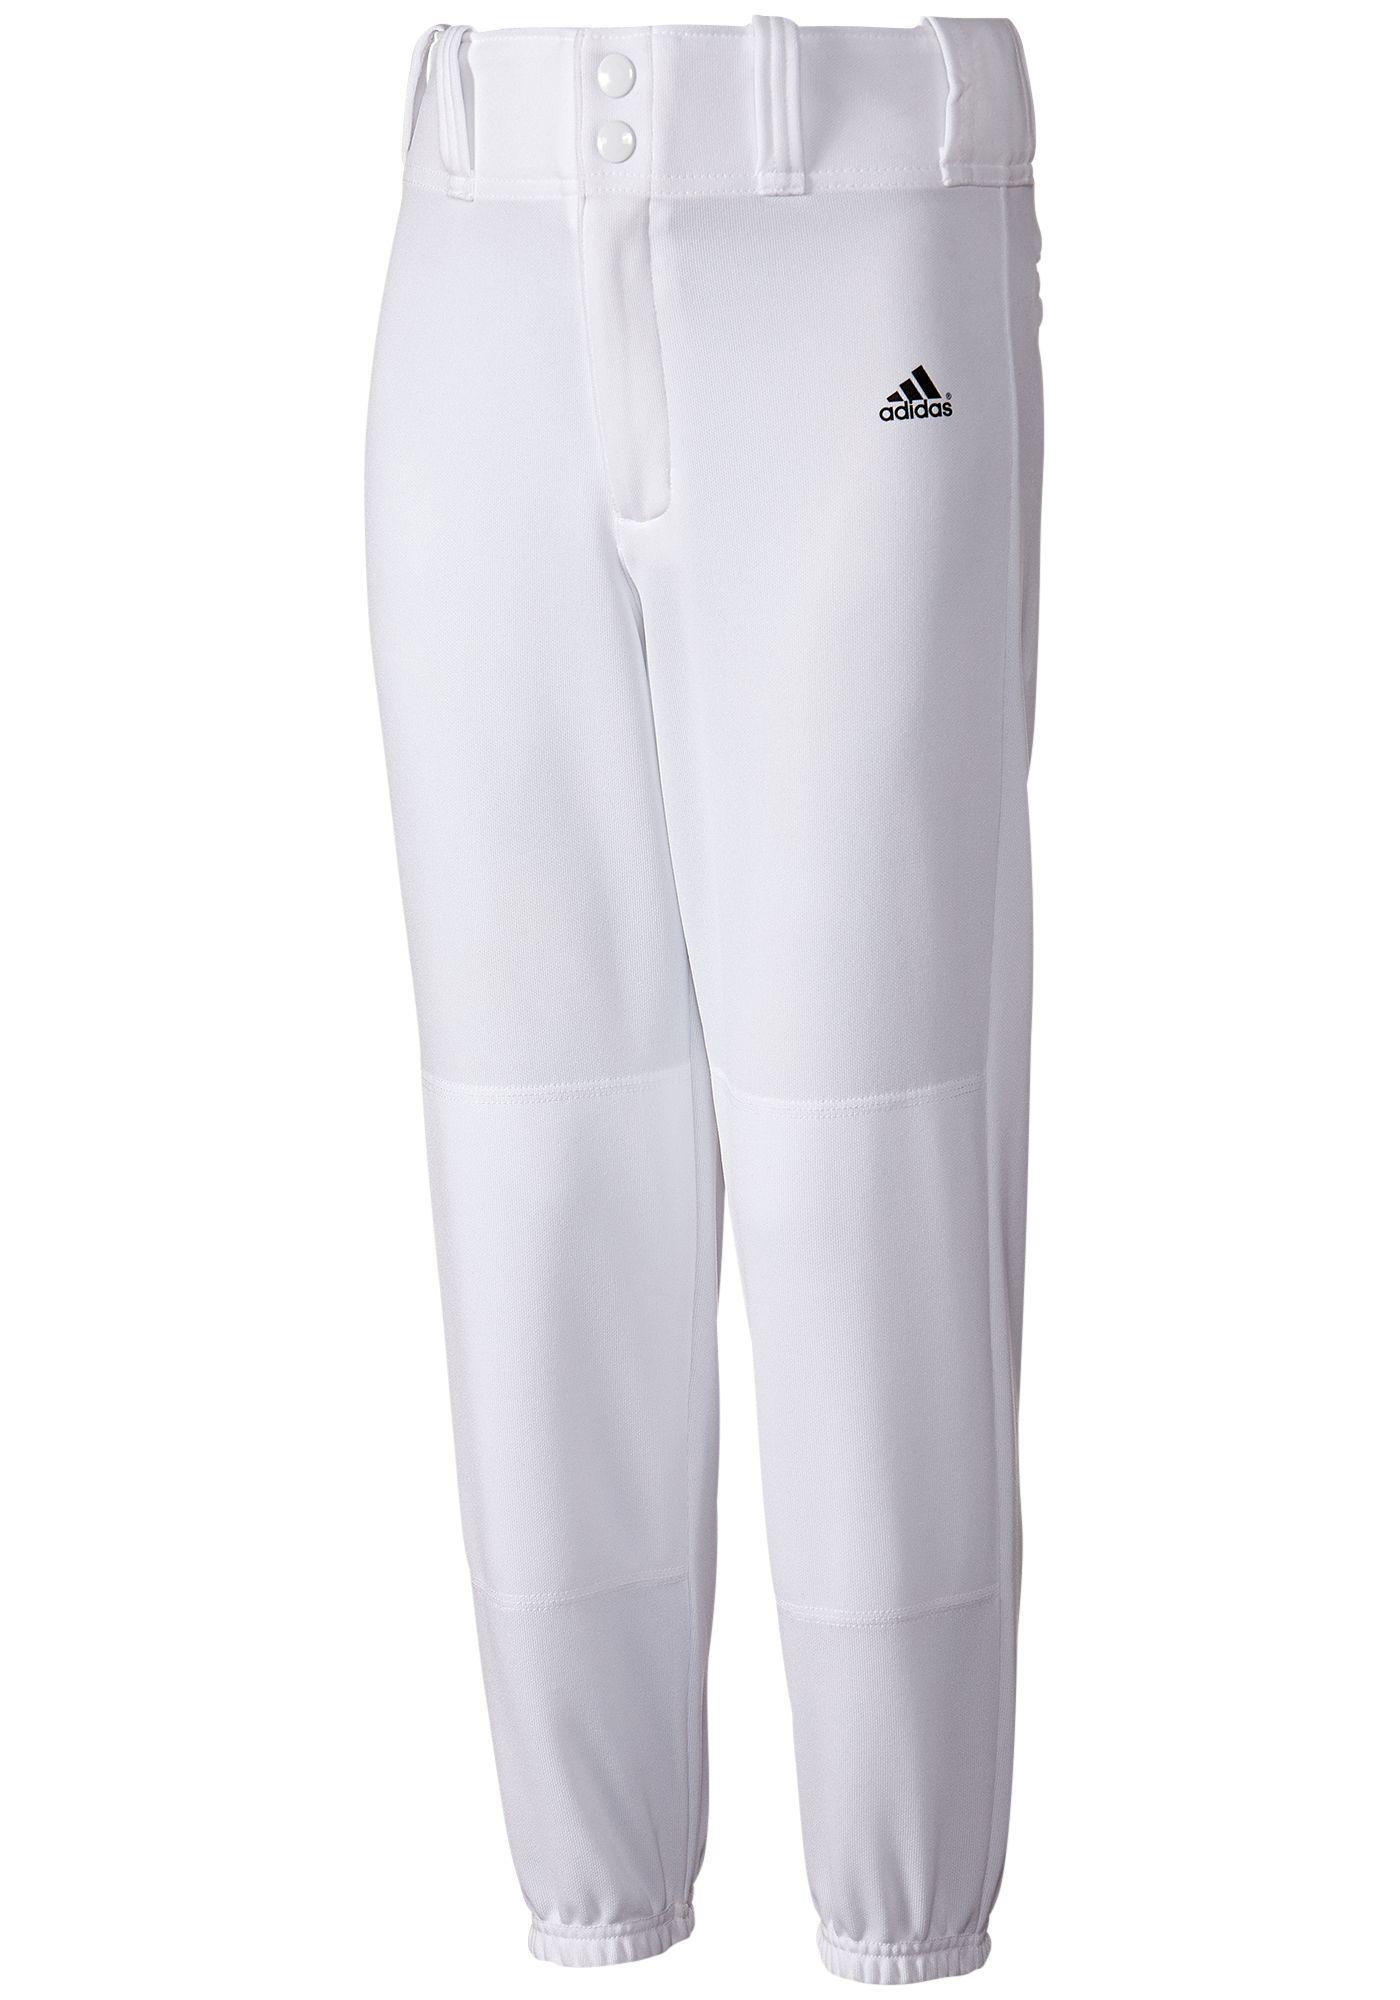 adidas Boys' Incite Closed Bottom Baseball Pants